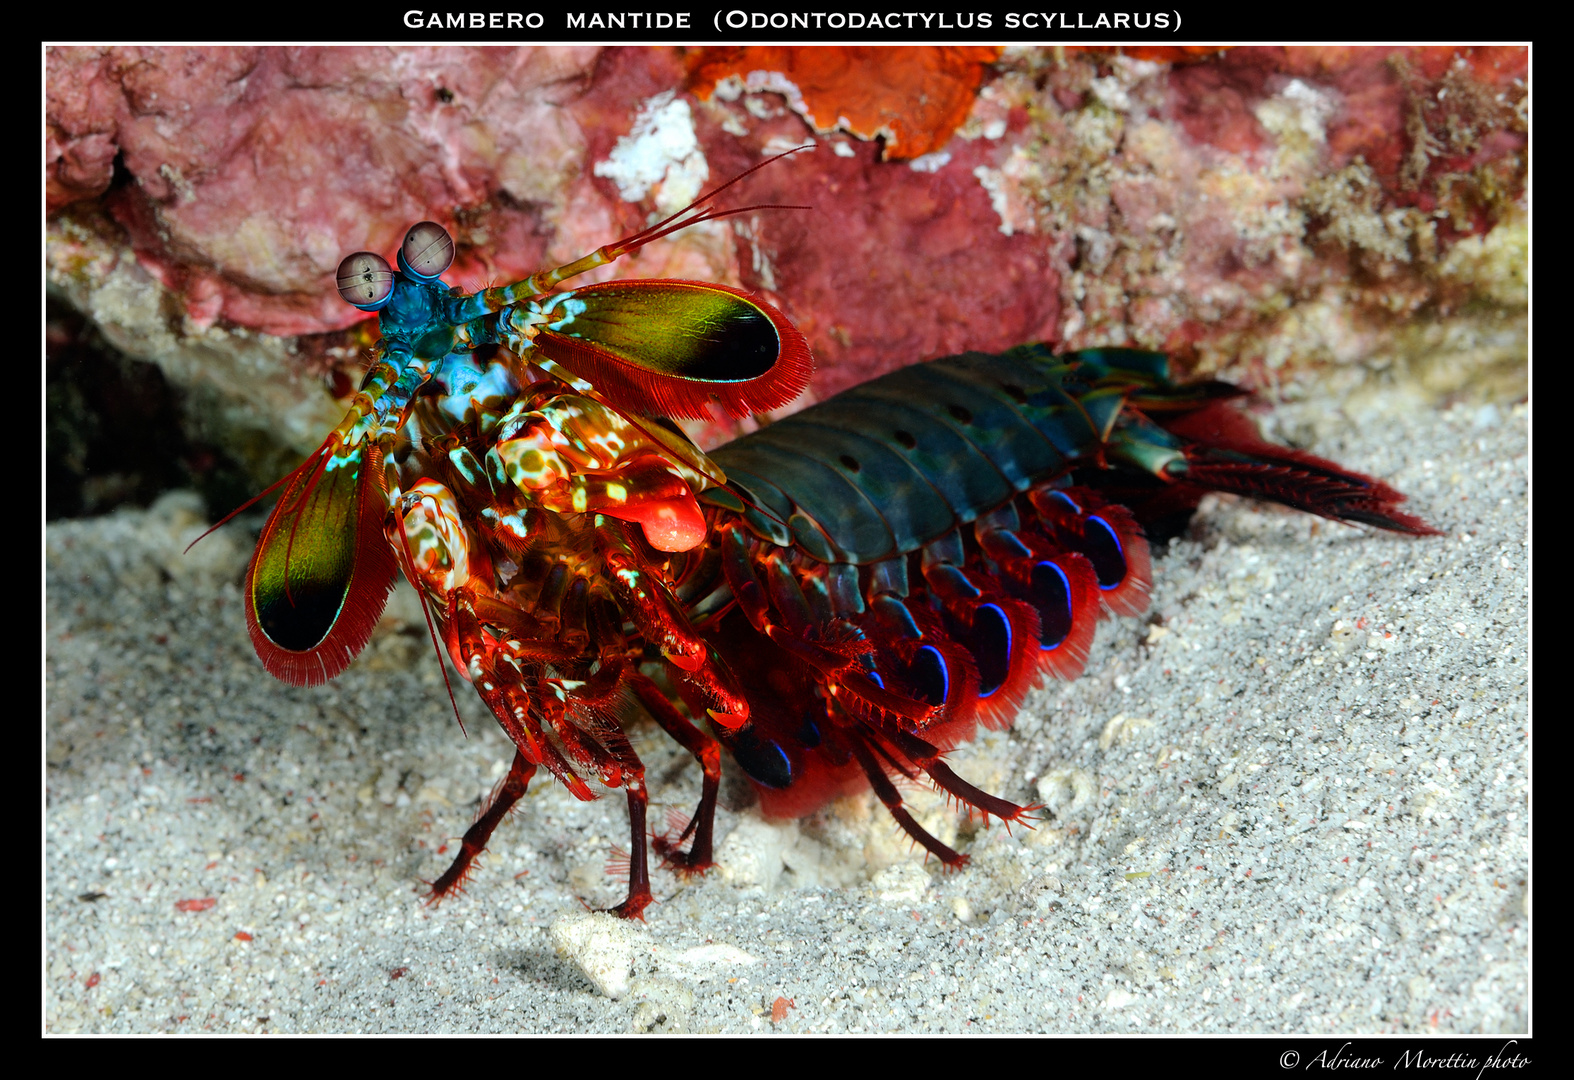 Gambero mantide (Odontodactylus scyllarus)